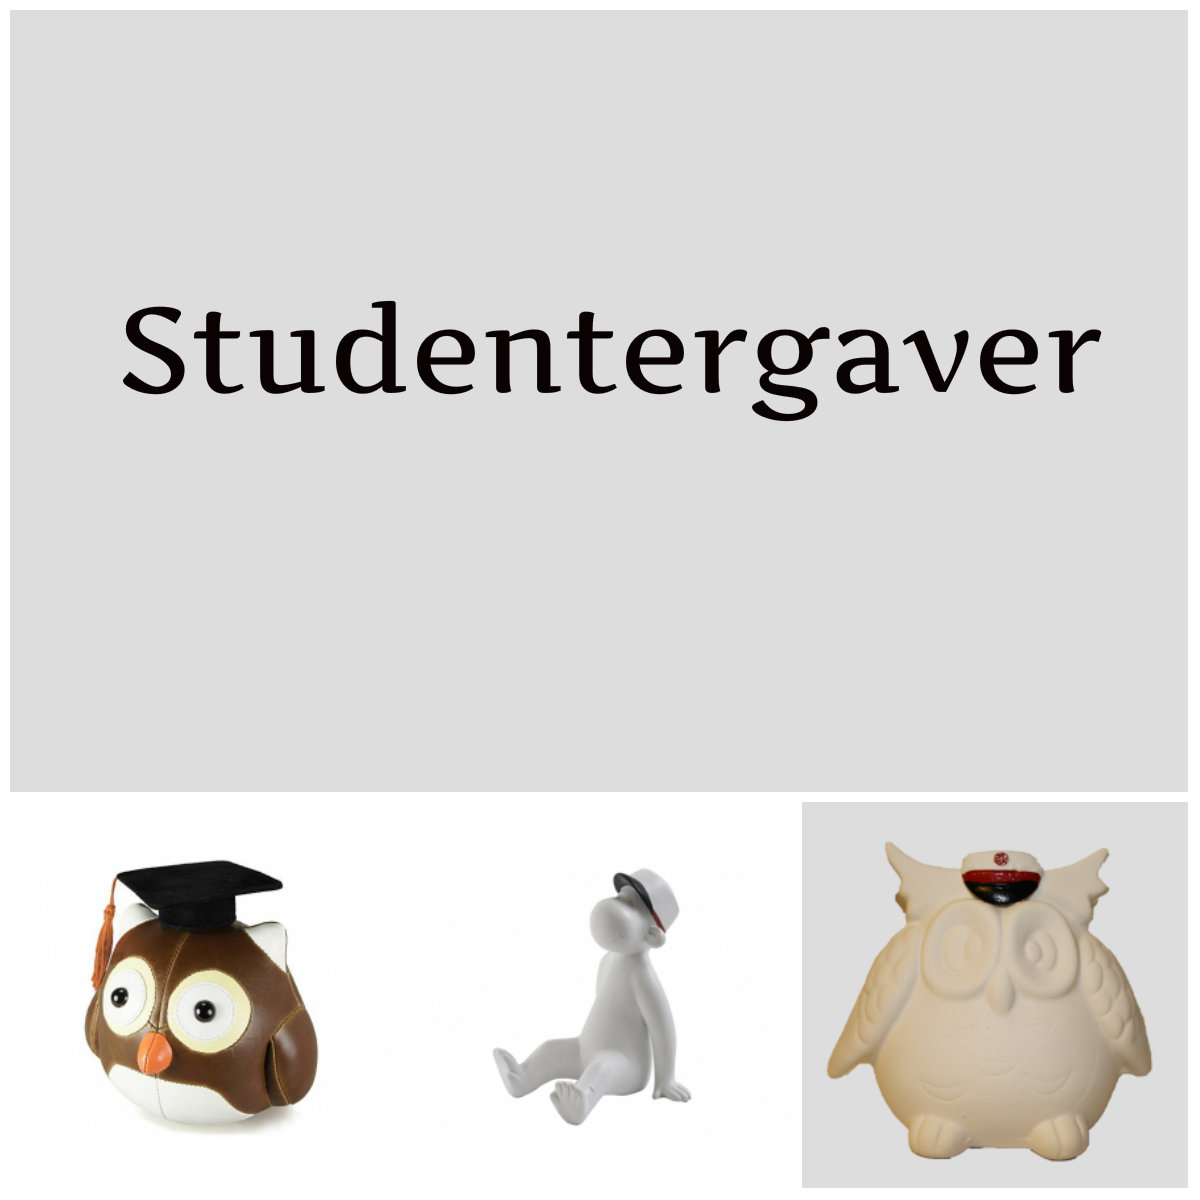 Studentergaver